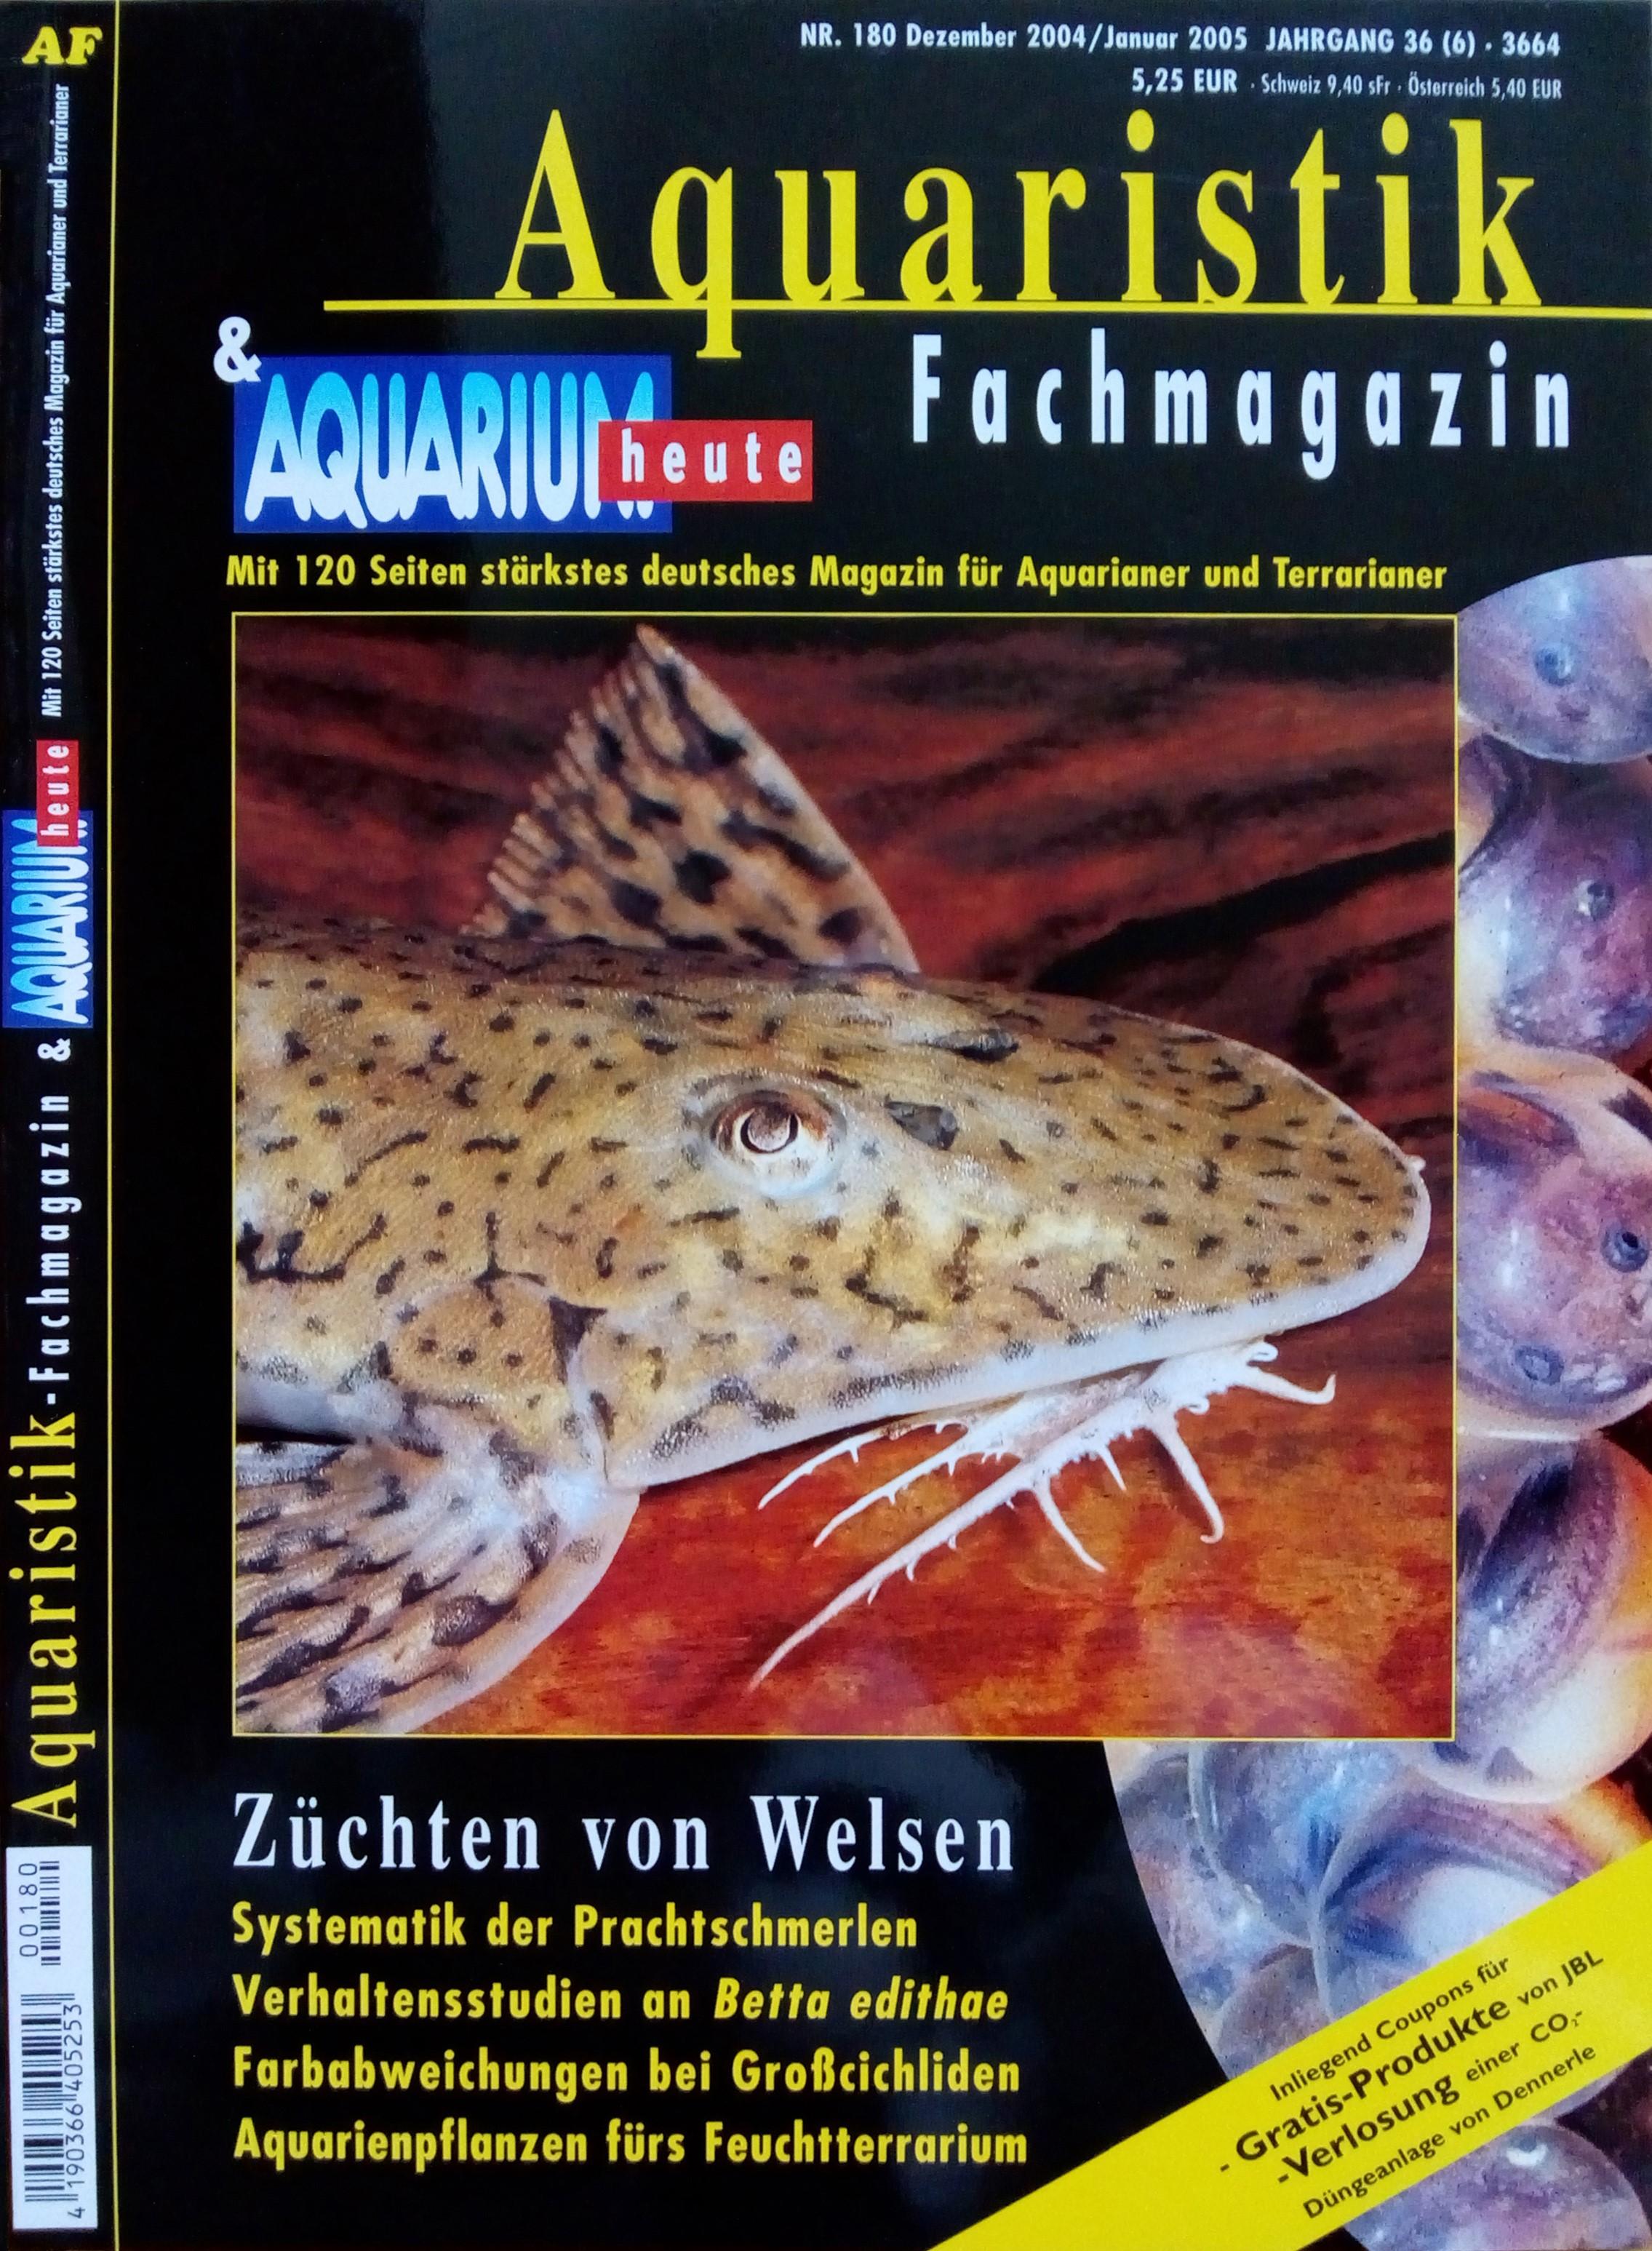 Aquaristik-Fachmagazin, Ausgabe 180